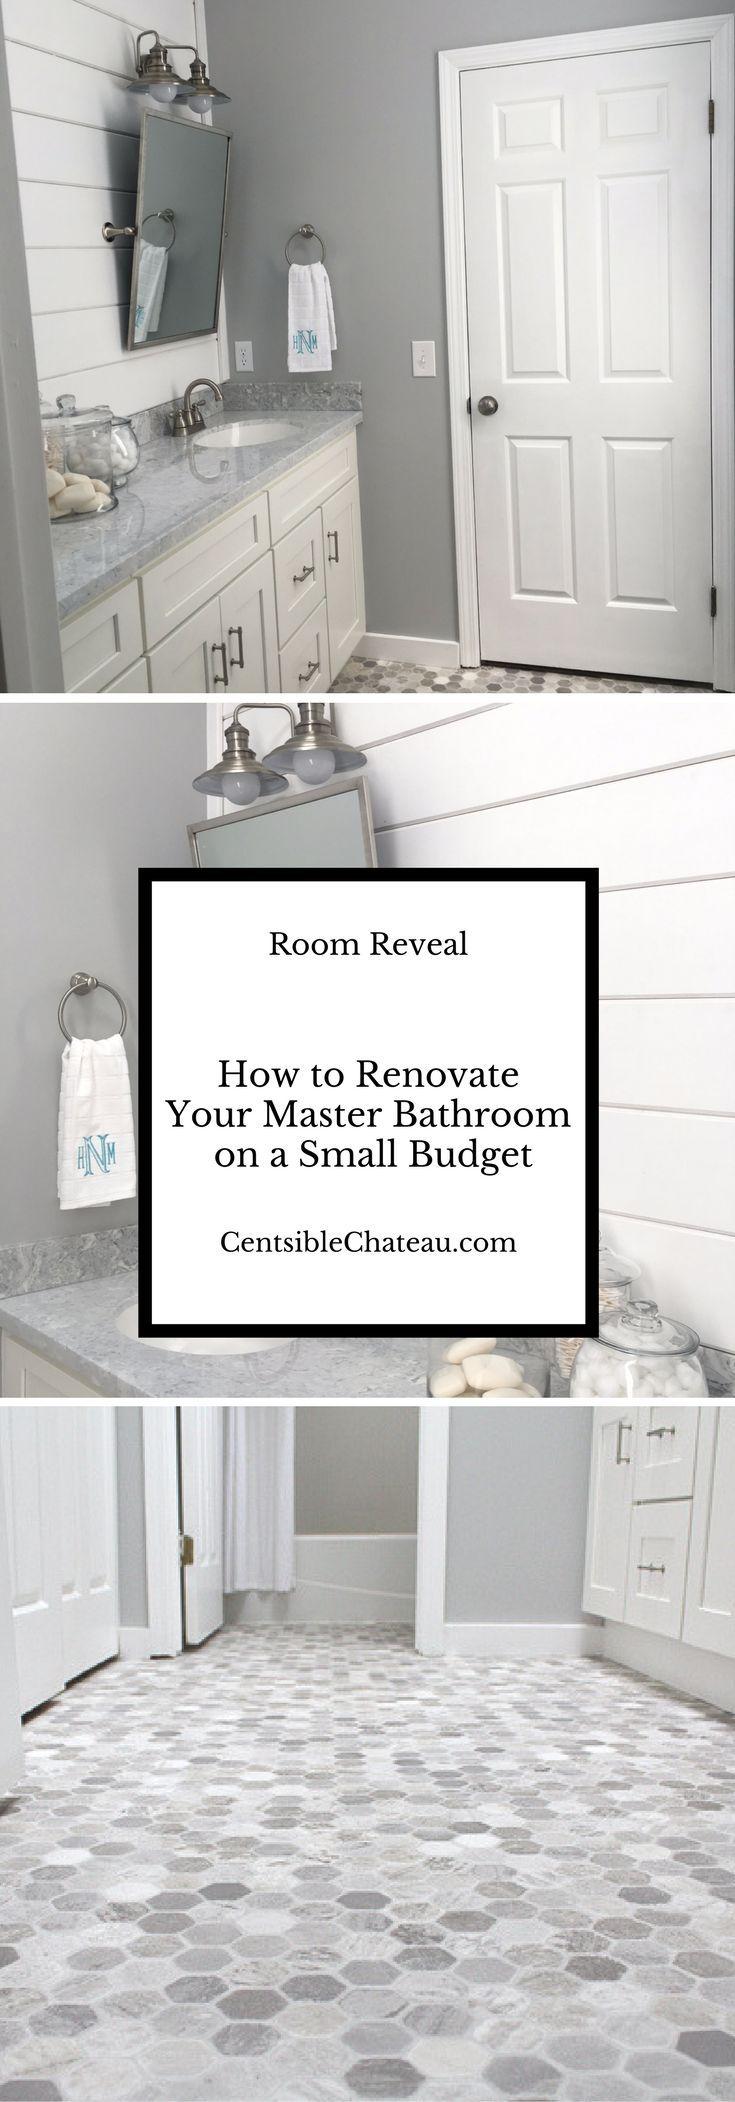 125 best Bathroom Remodel Ideas images on Pinterest | Bathroom ...